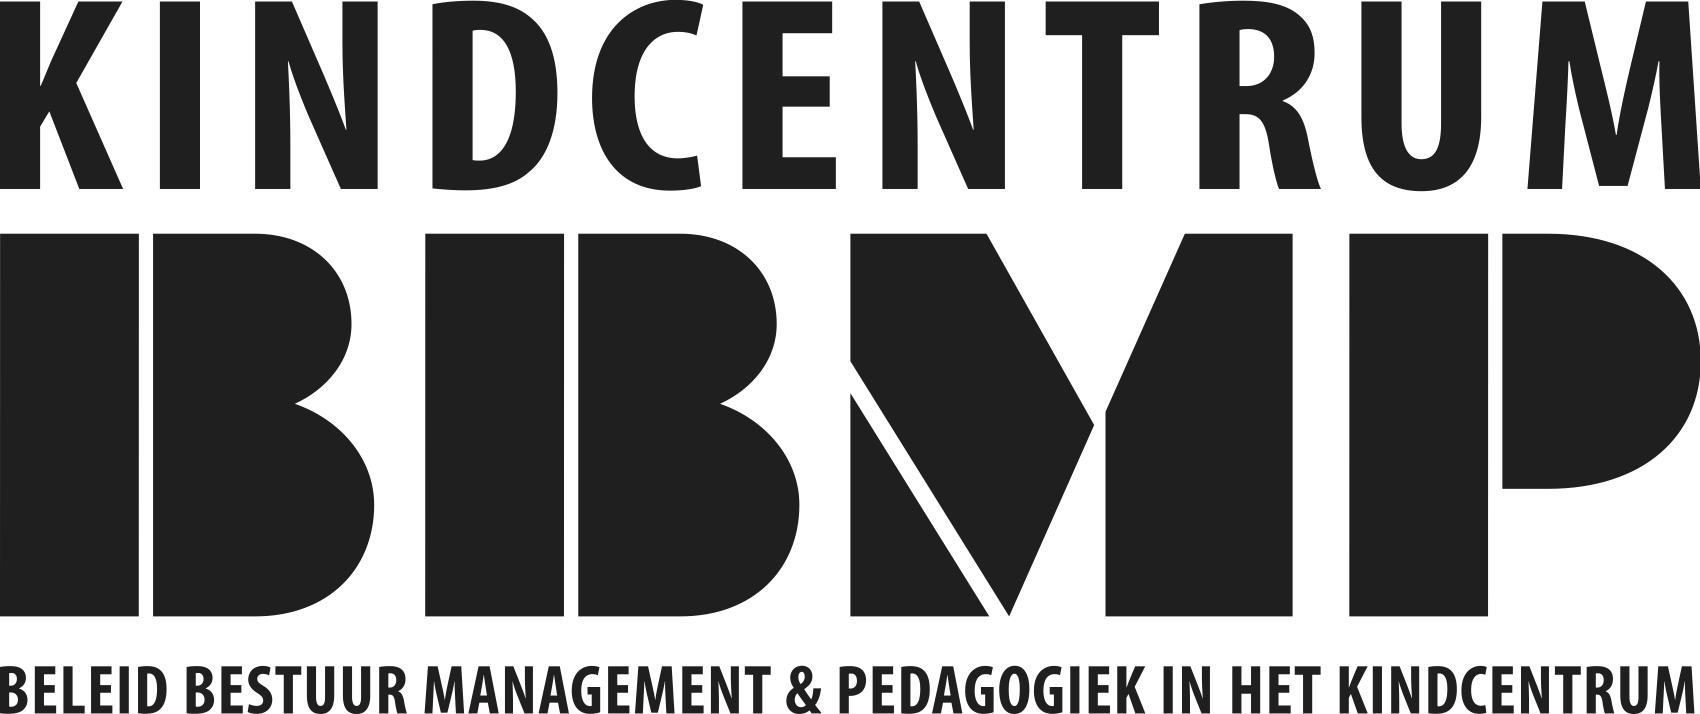 Logo_Kindcentrum_BBMP_sub